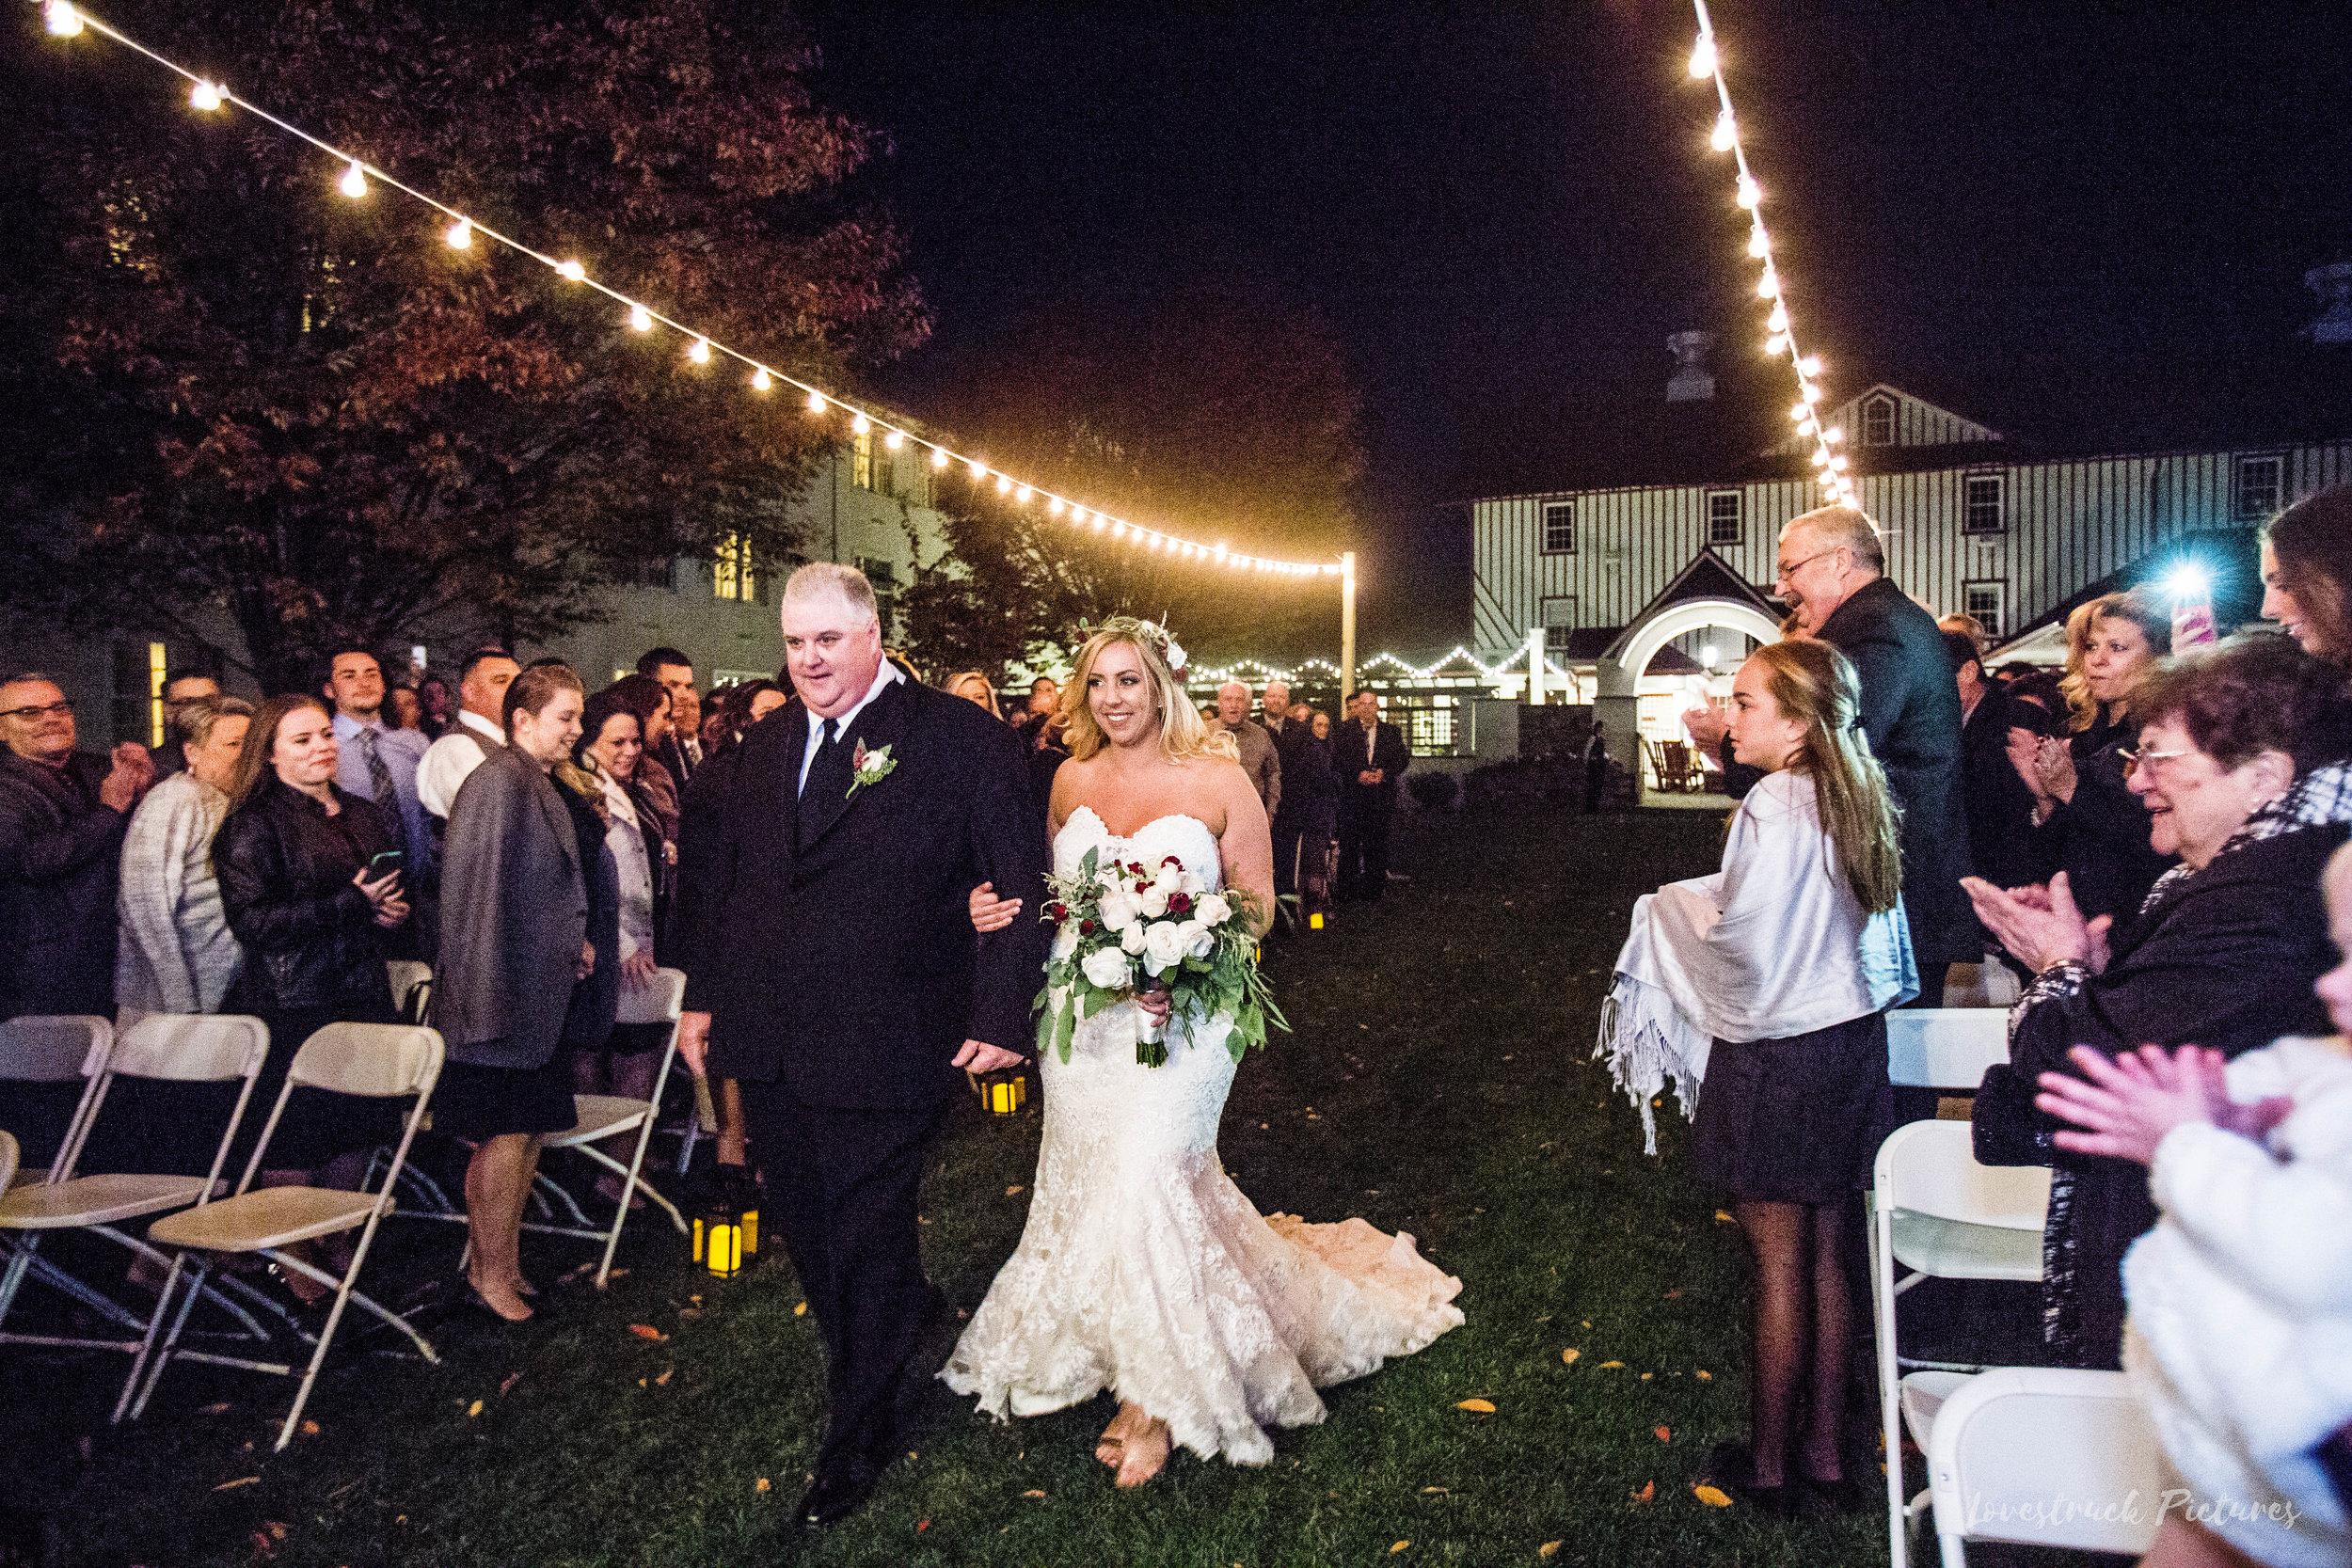 NORMANDY_FARMS_WEDDING_BLUEBELL_PA--49.jpg